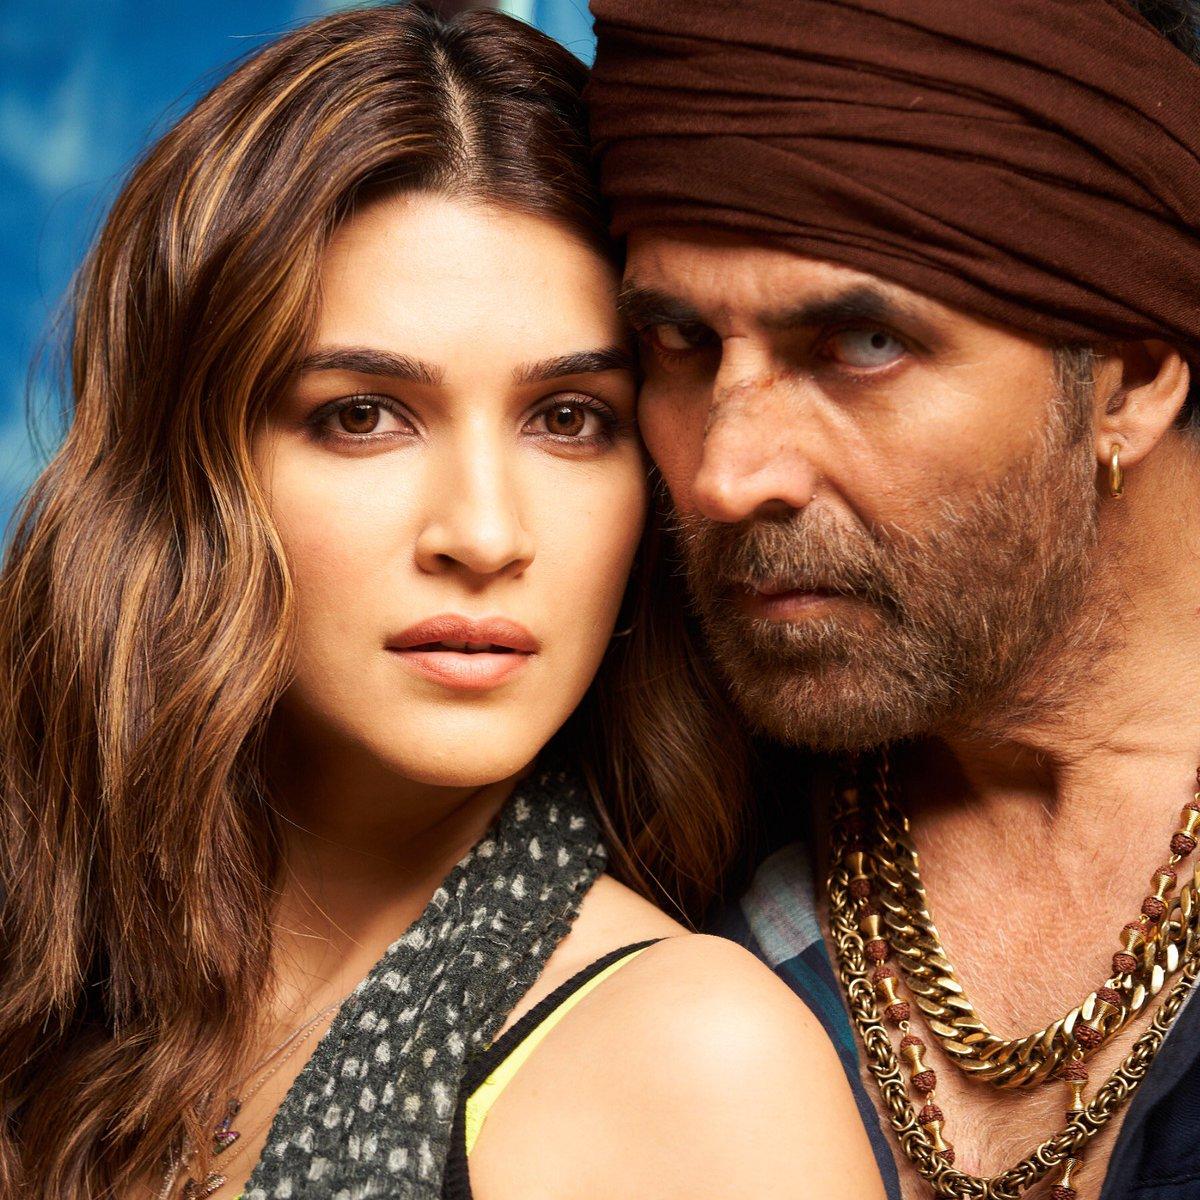 Anddd our Myra bids adieu to #BachchanPandey as @kritisanon wraps her sched with @akshaykumar 💥 Meet the gang in #SajidNadiadwala's #BachchanPandey in cinemas next year! 🔥 Directed by @farhad_samji 🎬   @WardaNadiadwala